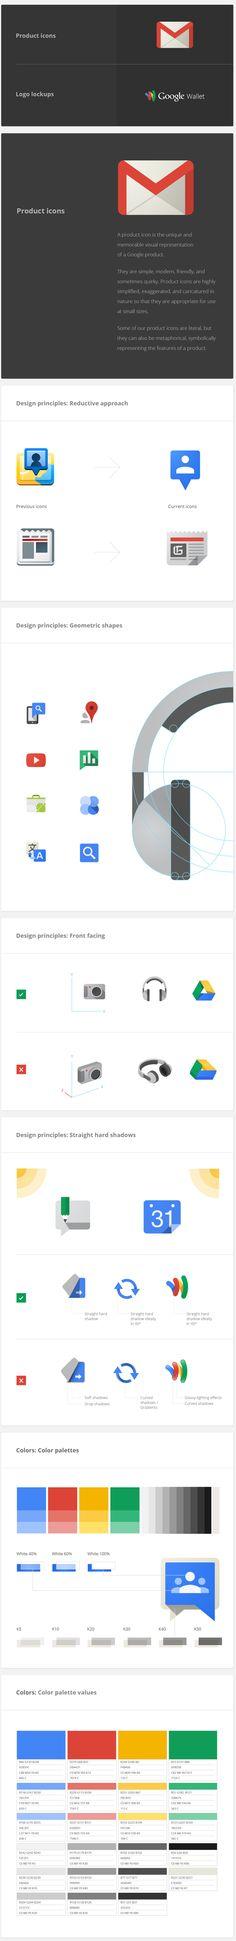 brand guidelines, googl visual, visual identity, icon design, flat design, brand design, asset guidelin, visual asset, flat icons